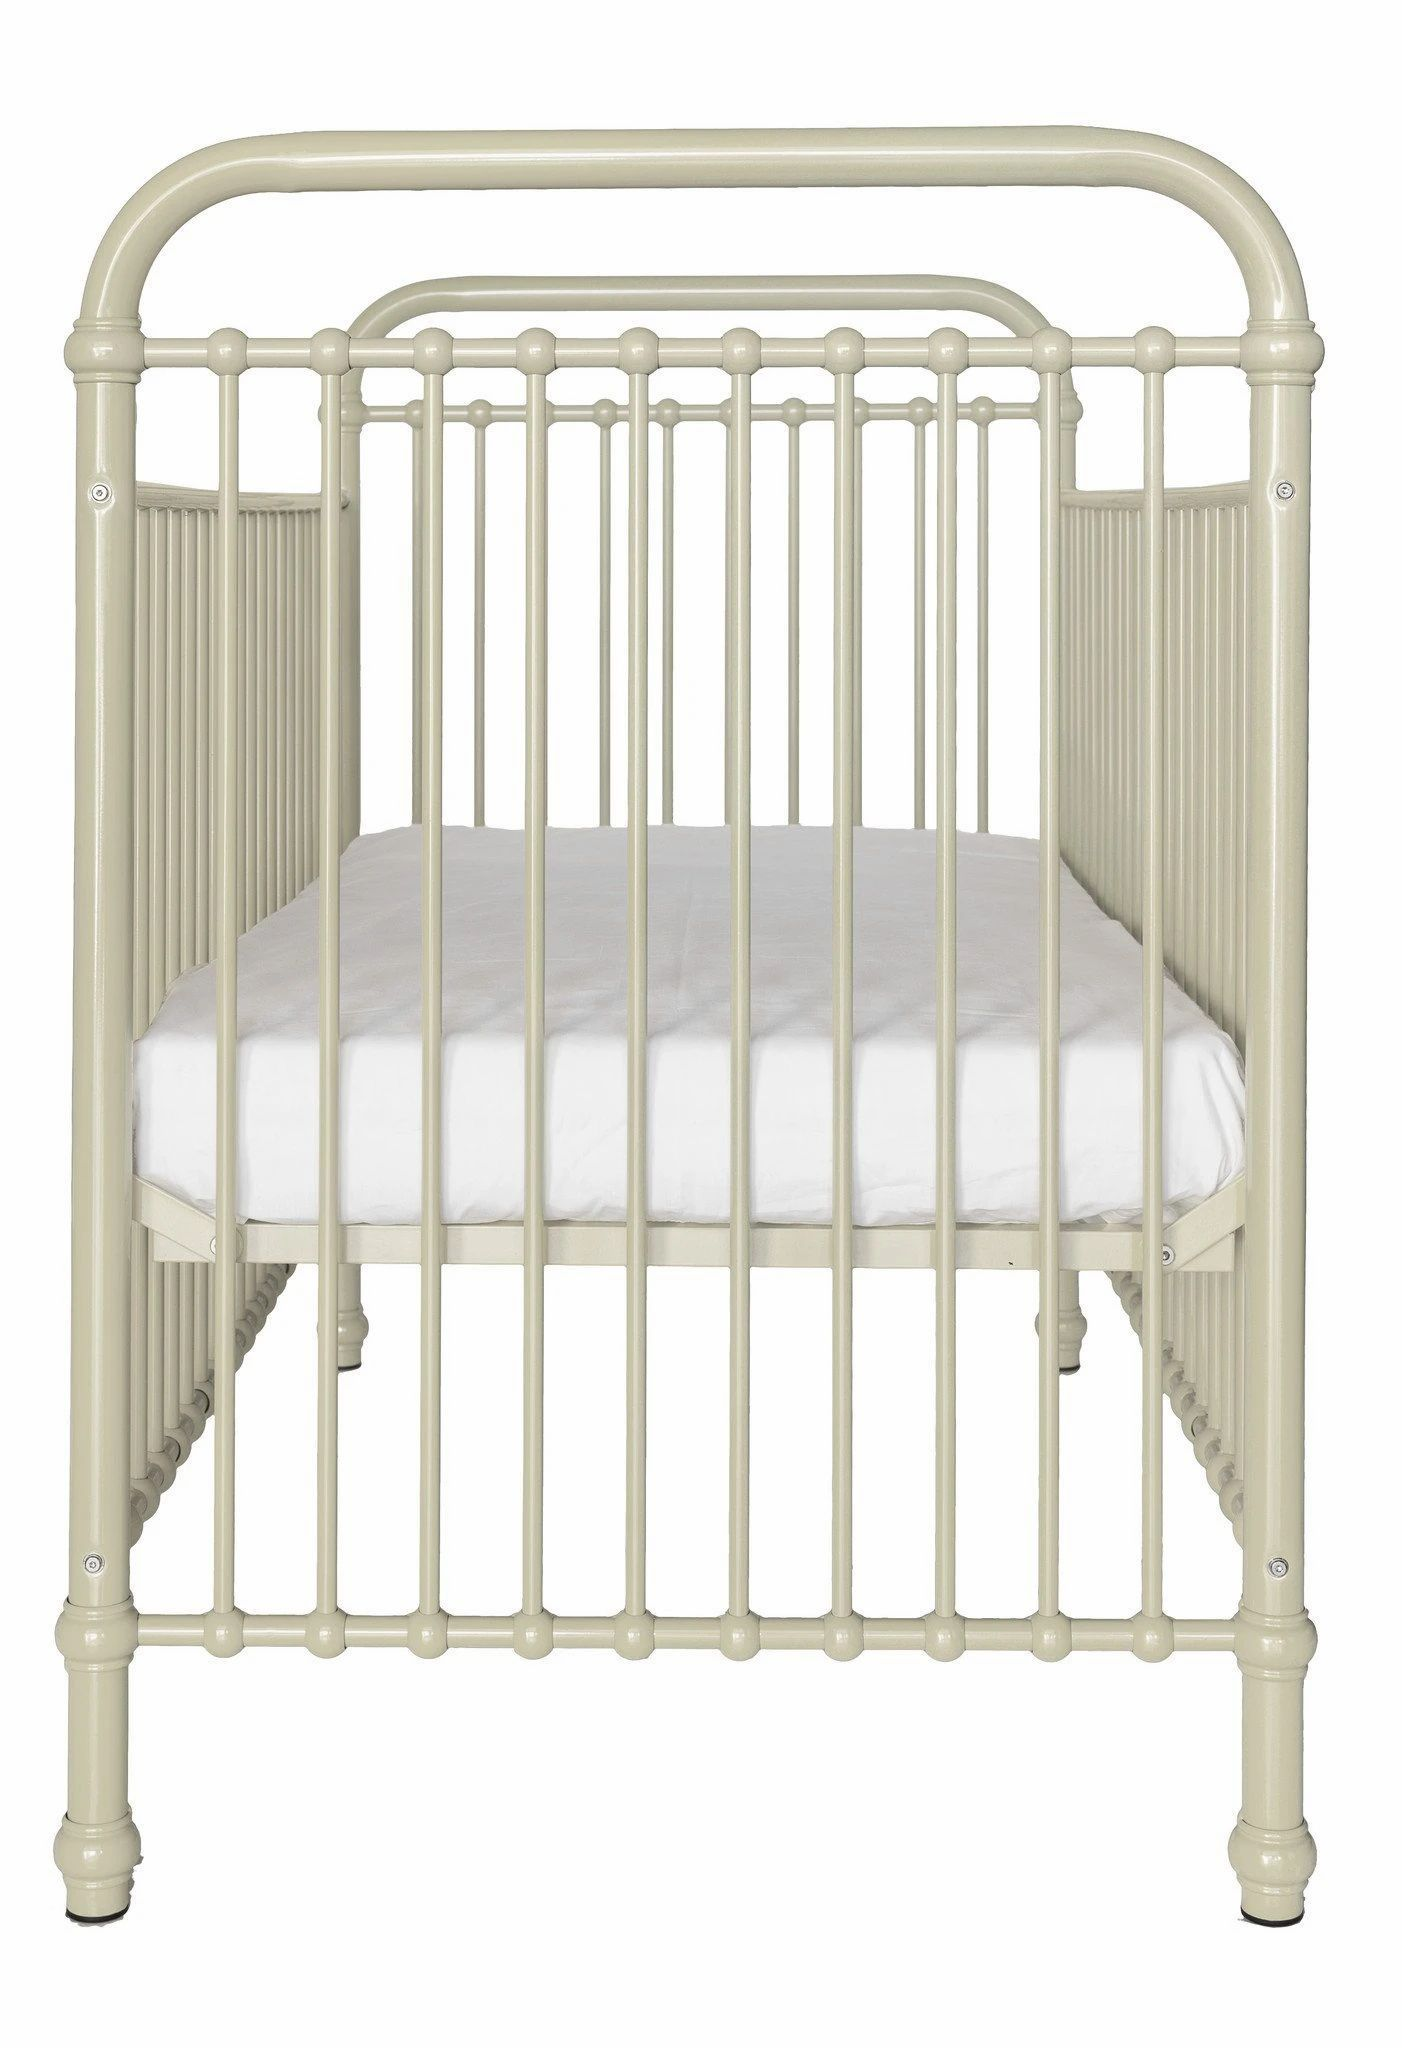 Reese Crib Cribs White Crib Big Boys Bedding White baby cribs for sale